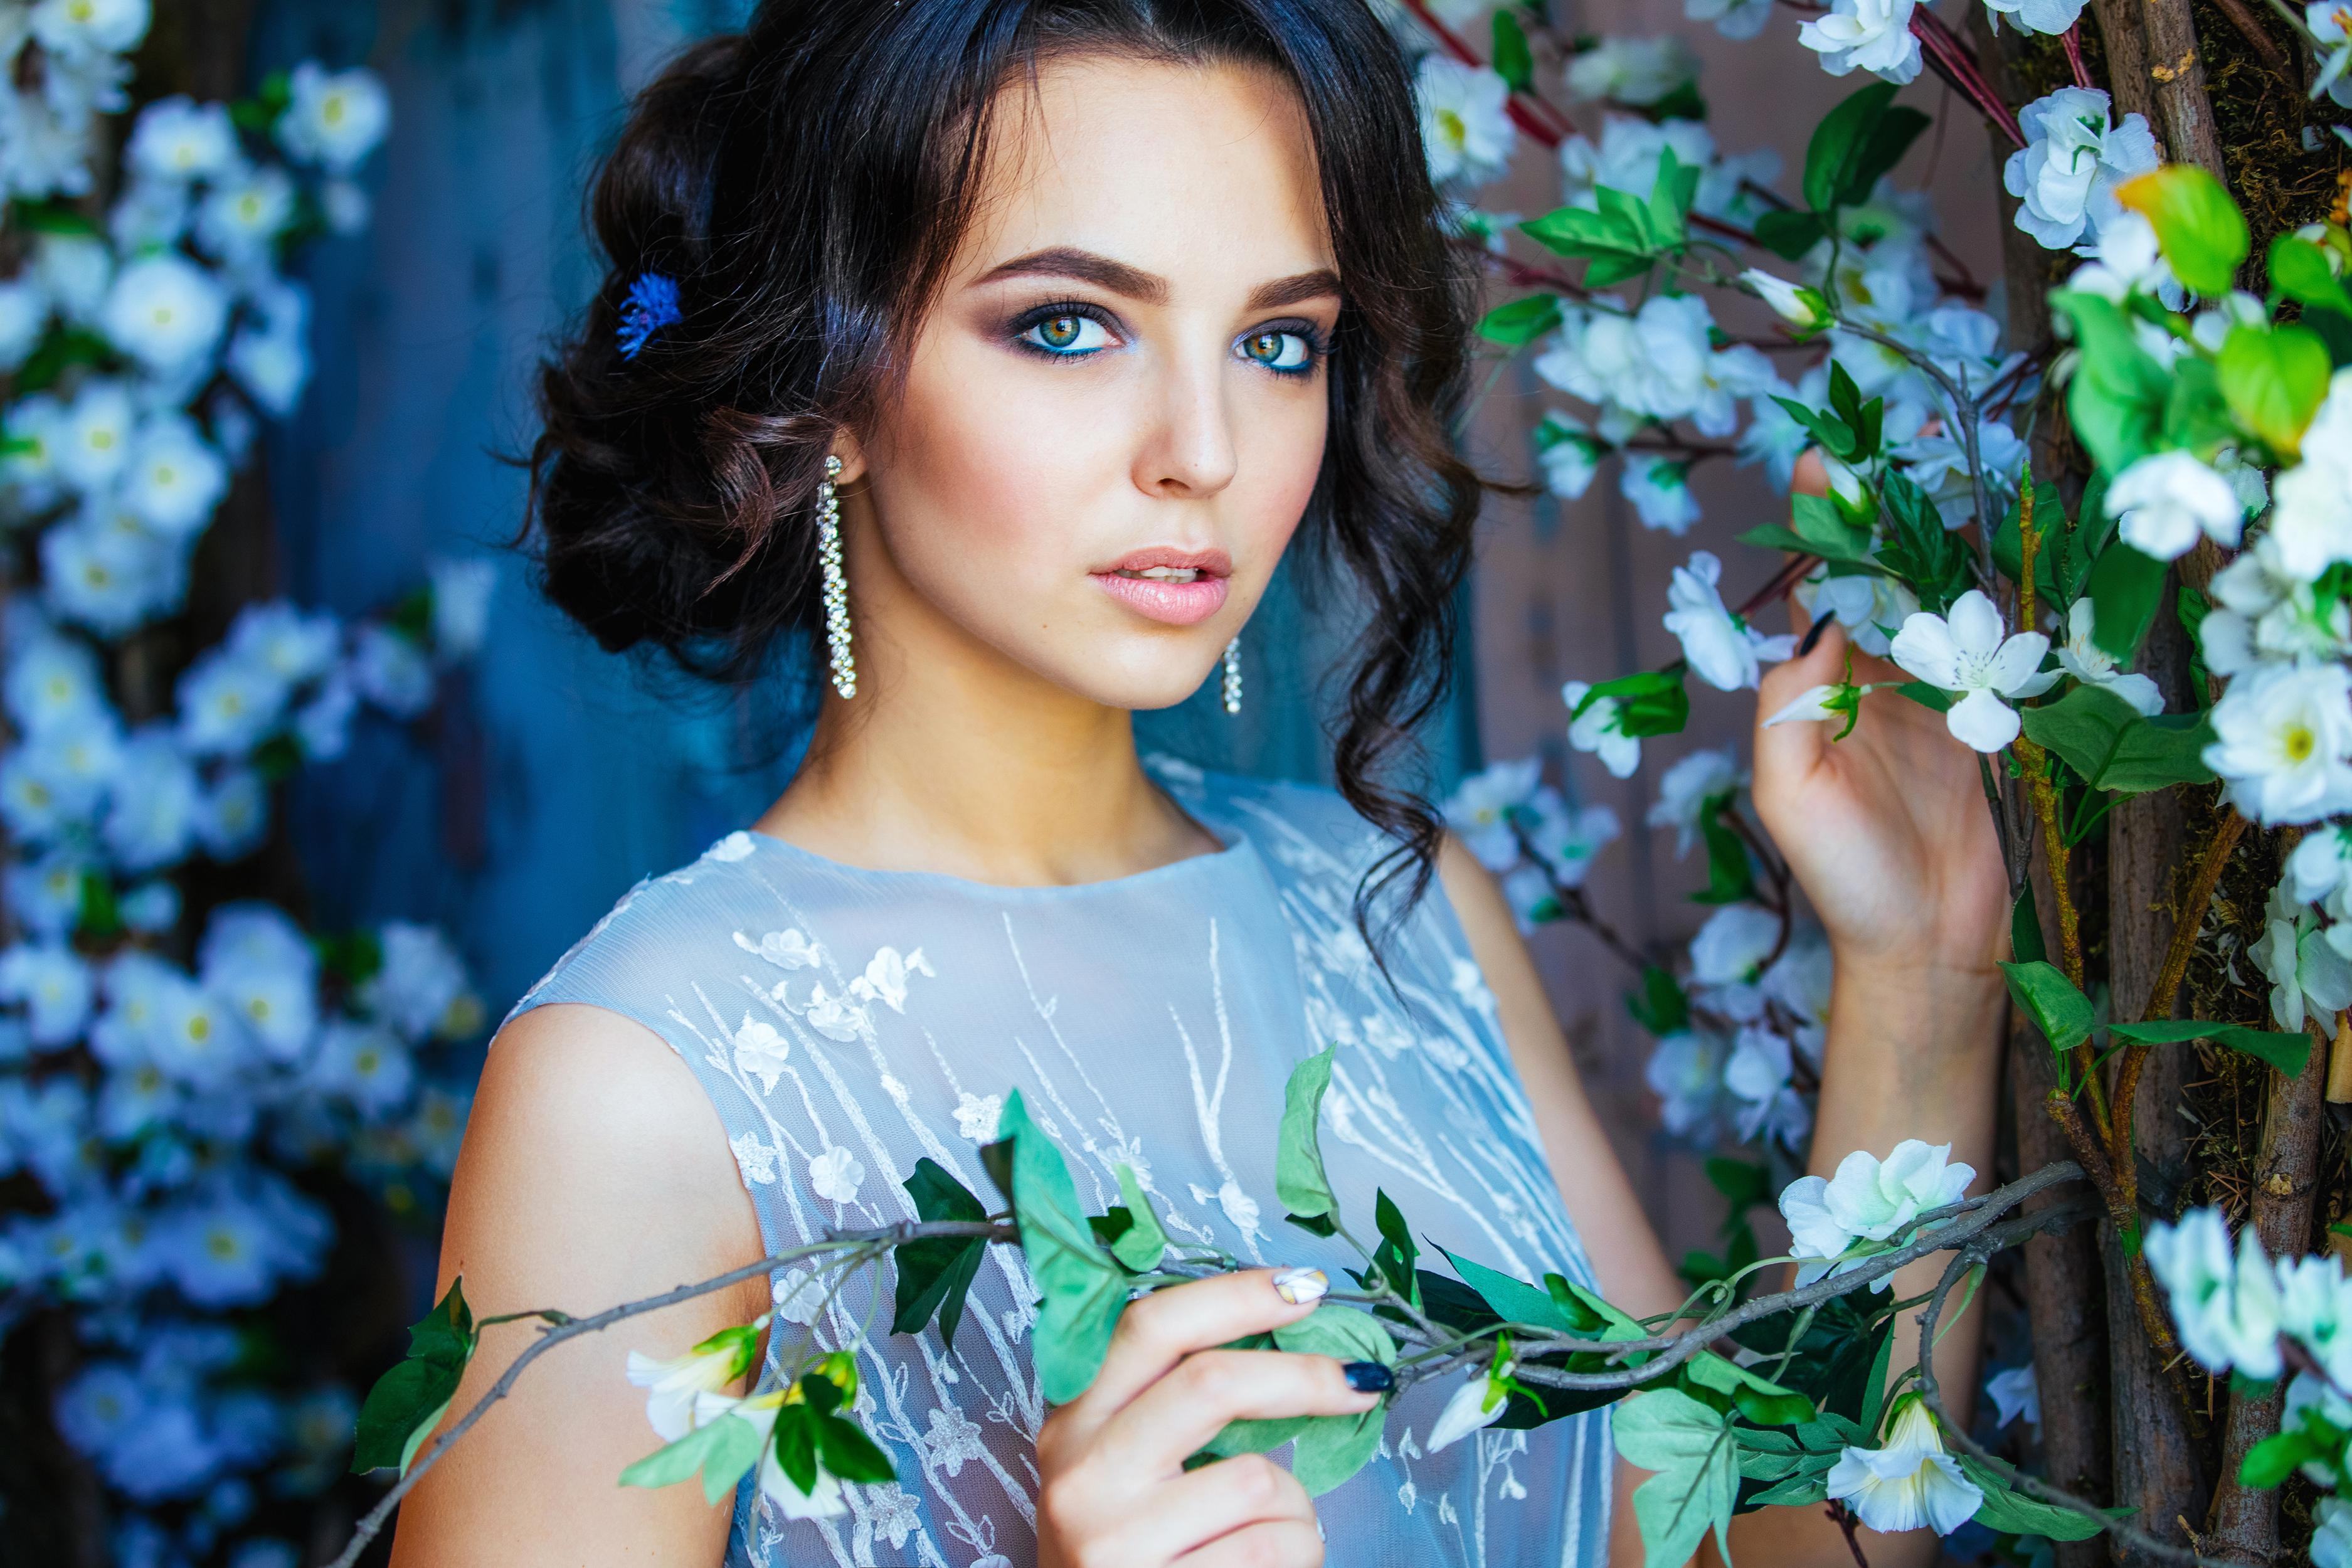 Фото картинки девушек с цветами брюнетки